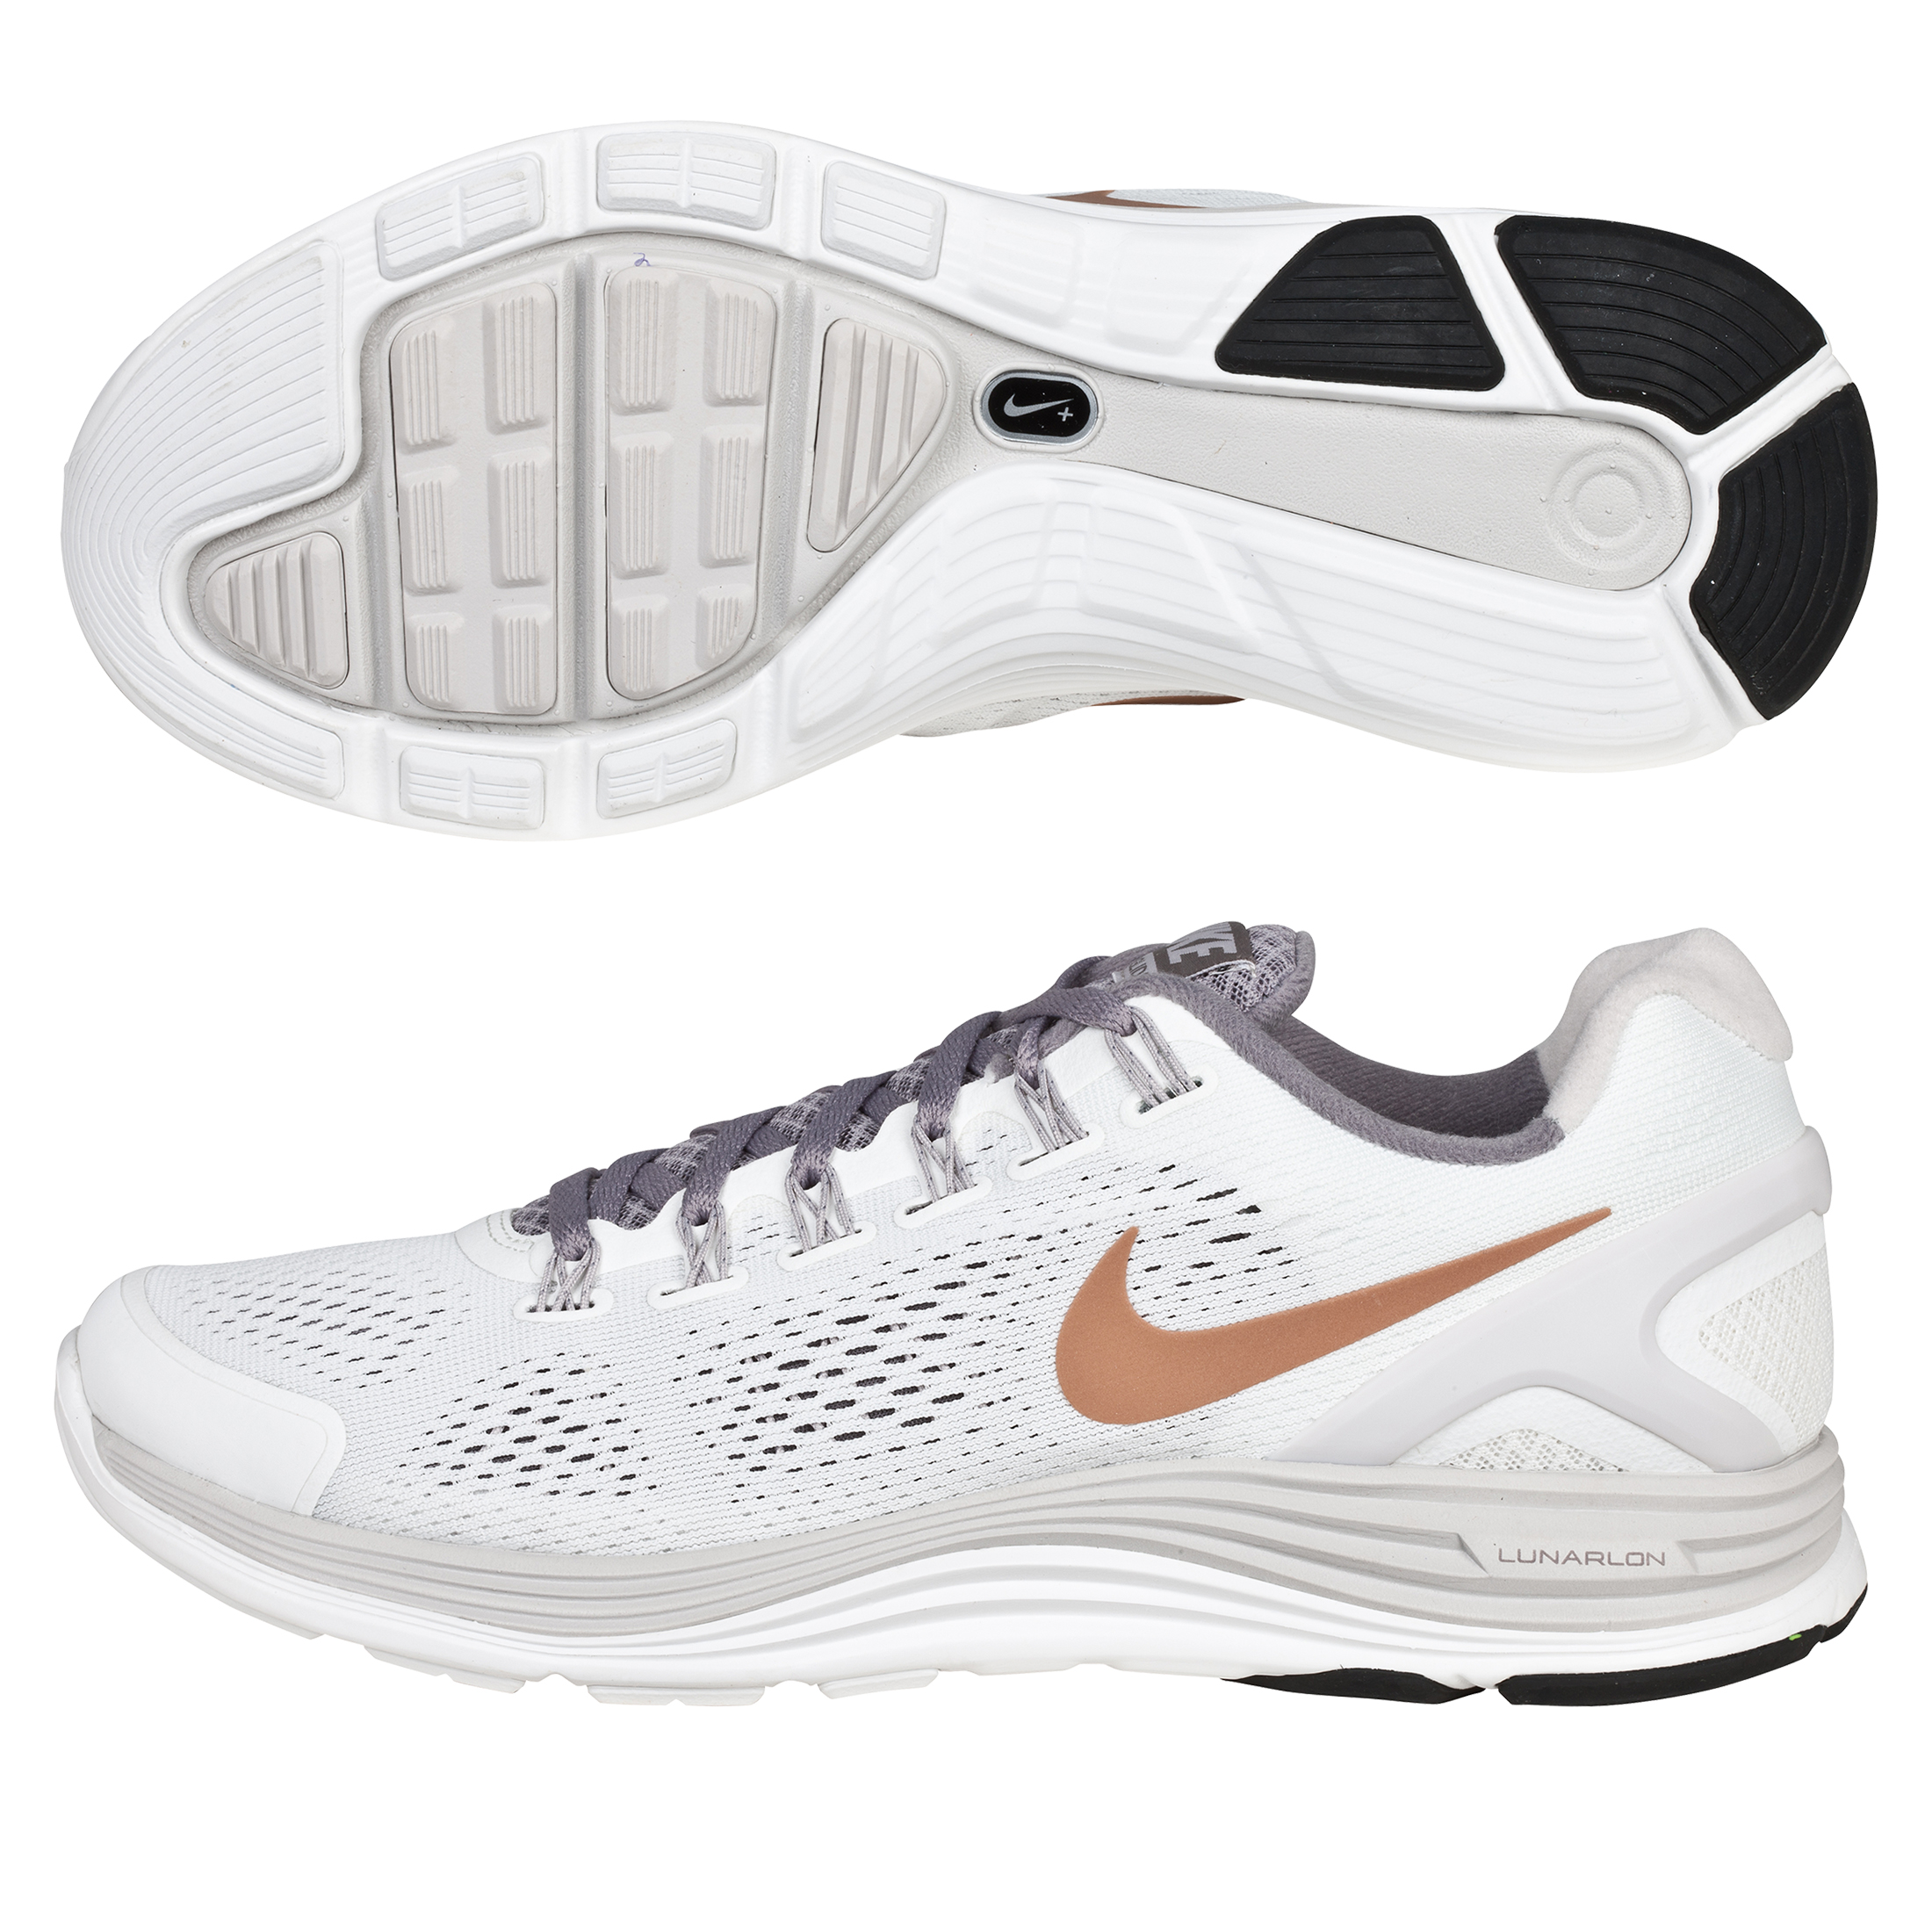 Nike Lunarglide +4 Stability Trainer - Summit White/Sport Grey - Womens